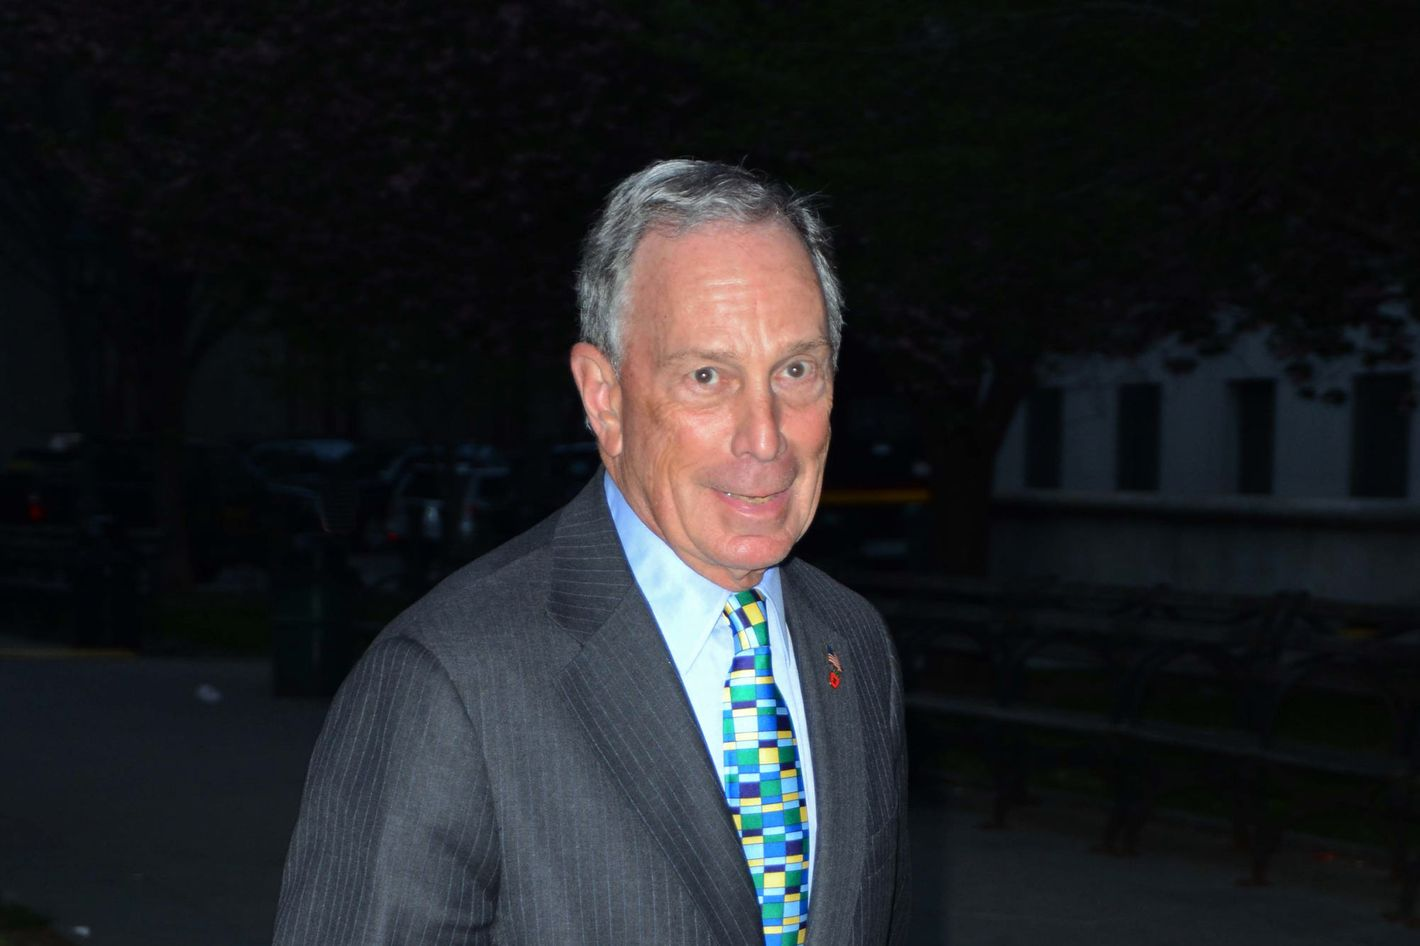 Bloomberg, in a photo taken pre-Sandy.